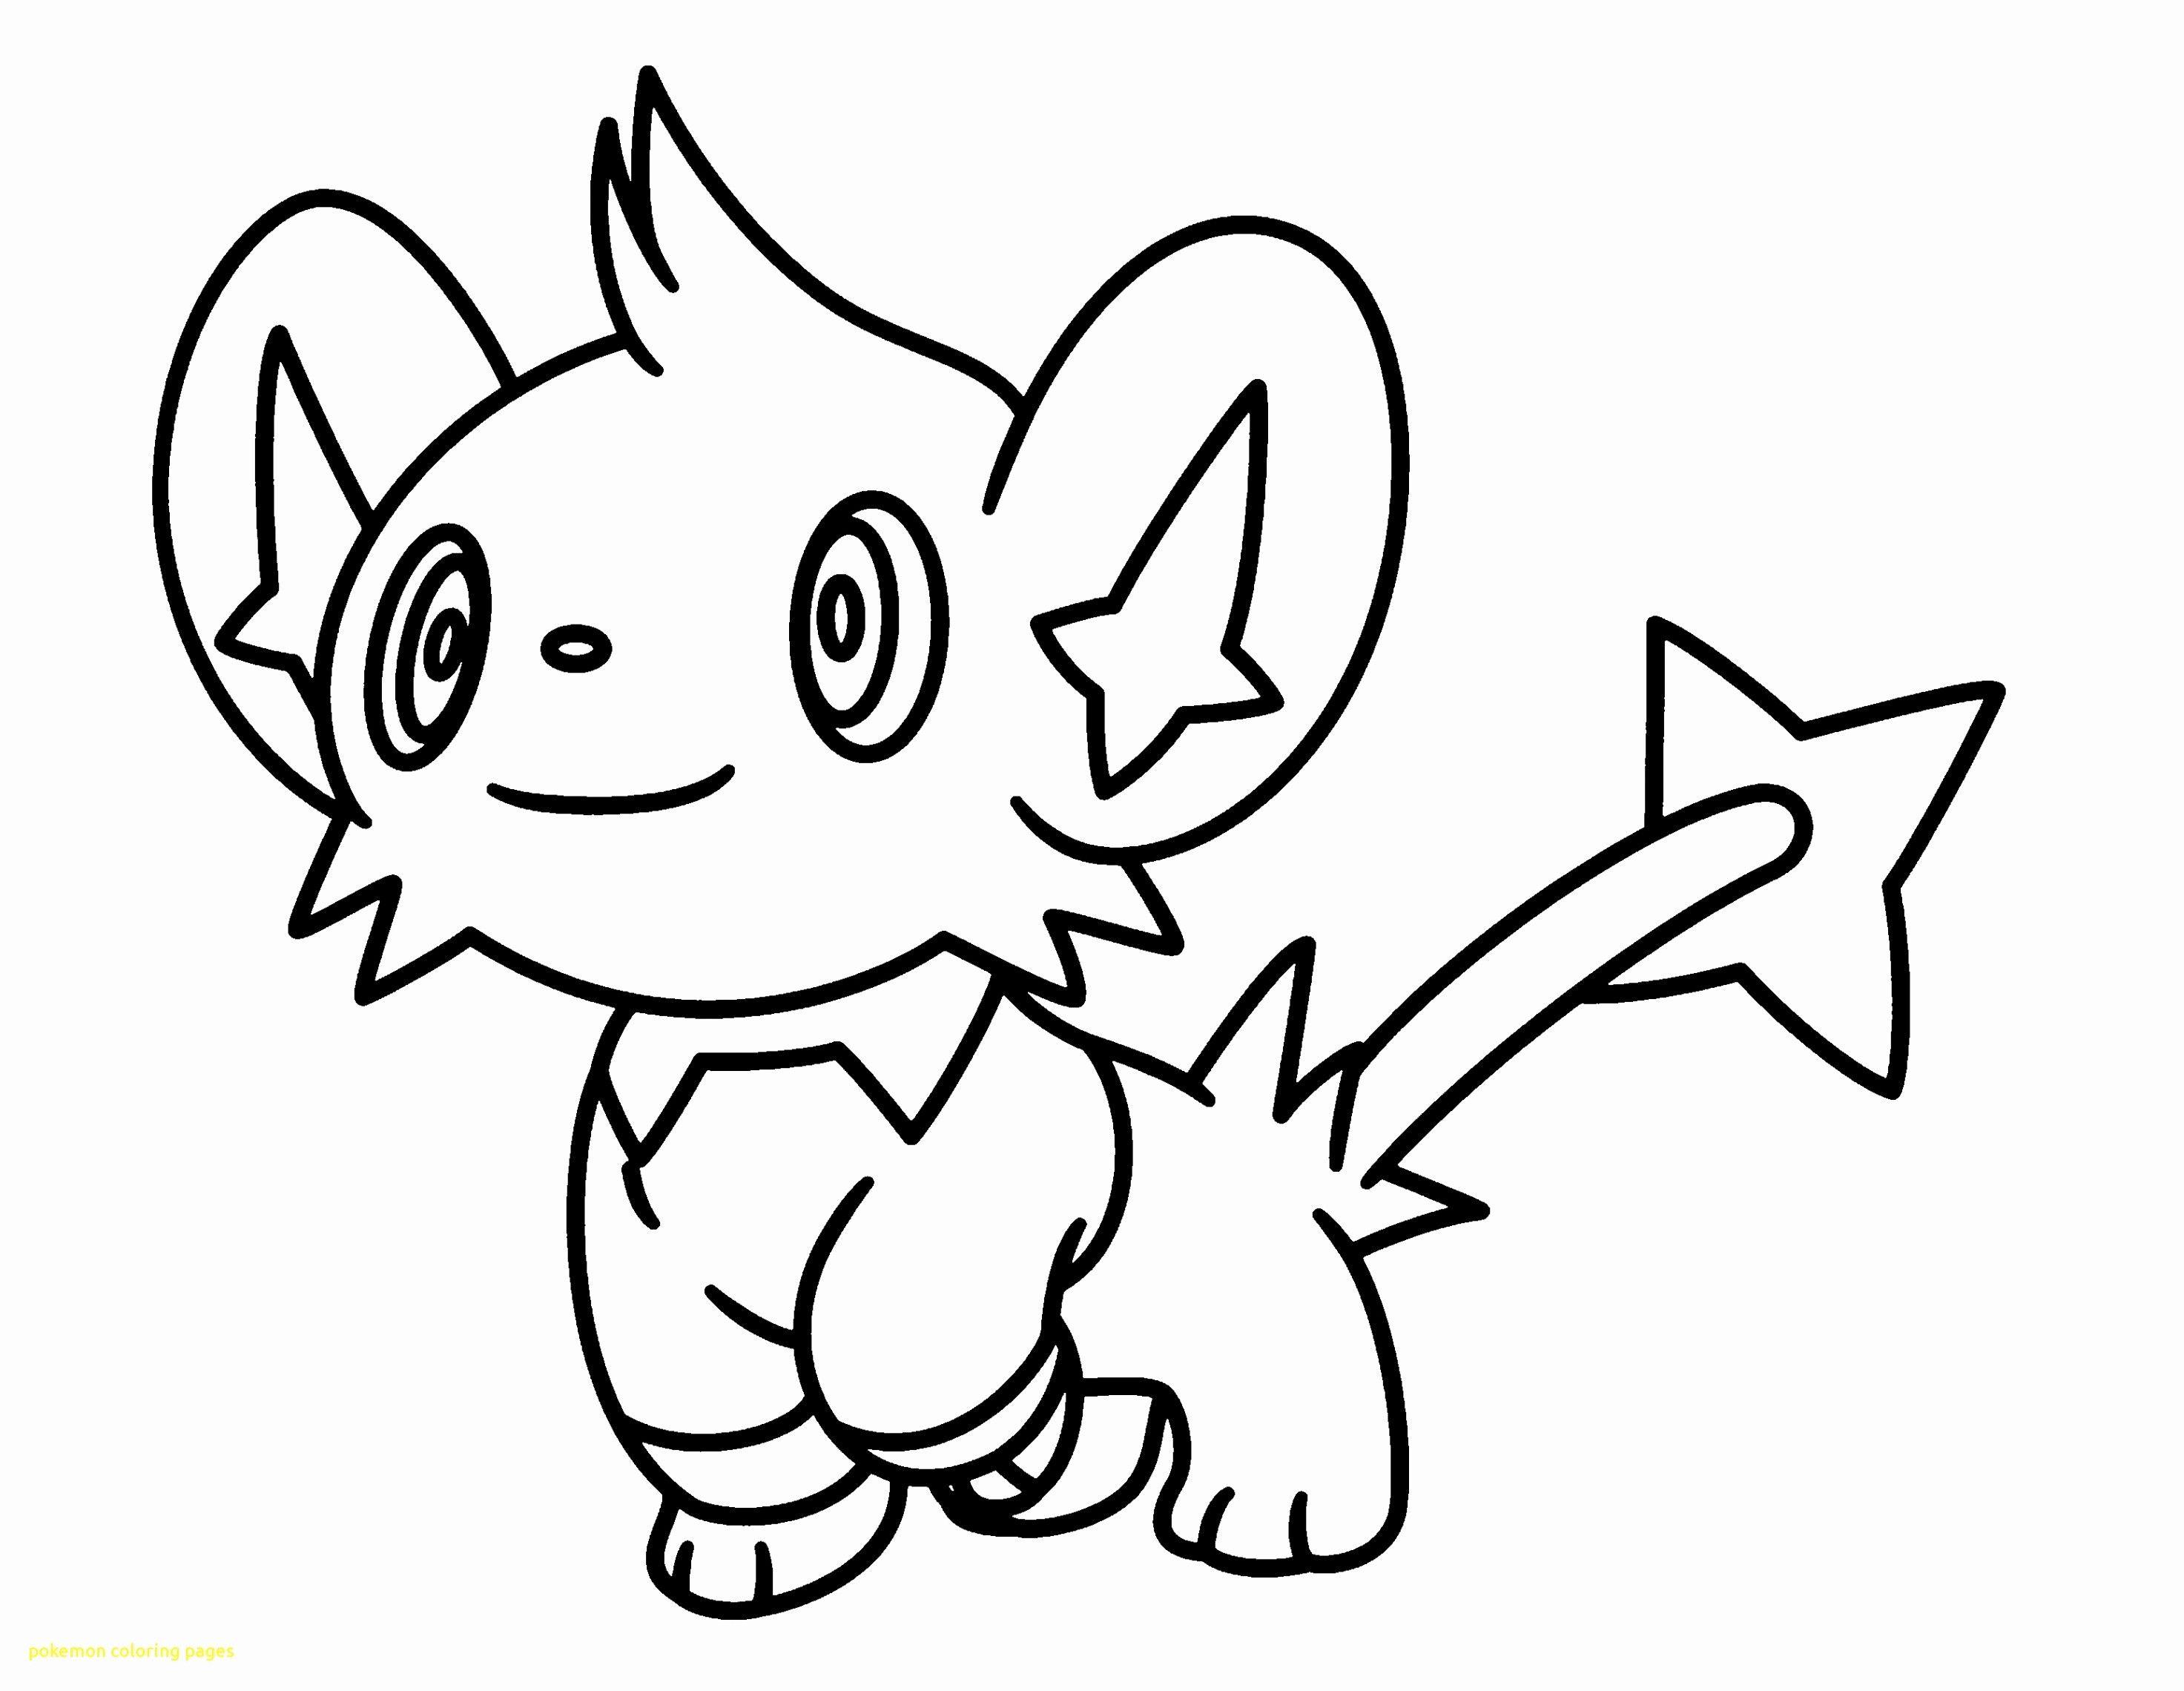 27 Inspiration Image Of Free Printable Pokemon Coloring Pages Entitlementtrap Com Pokemon Coloring Pikachu Coloring Page Pokemon Coloring Sheets